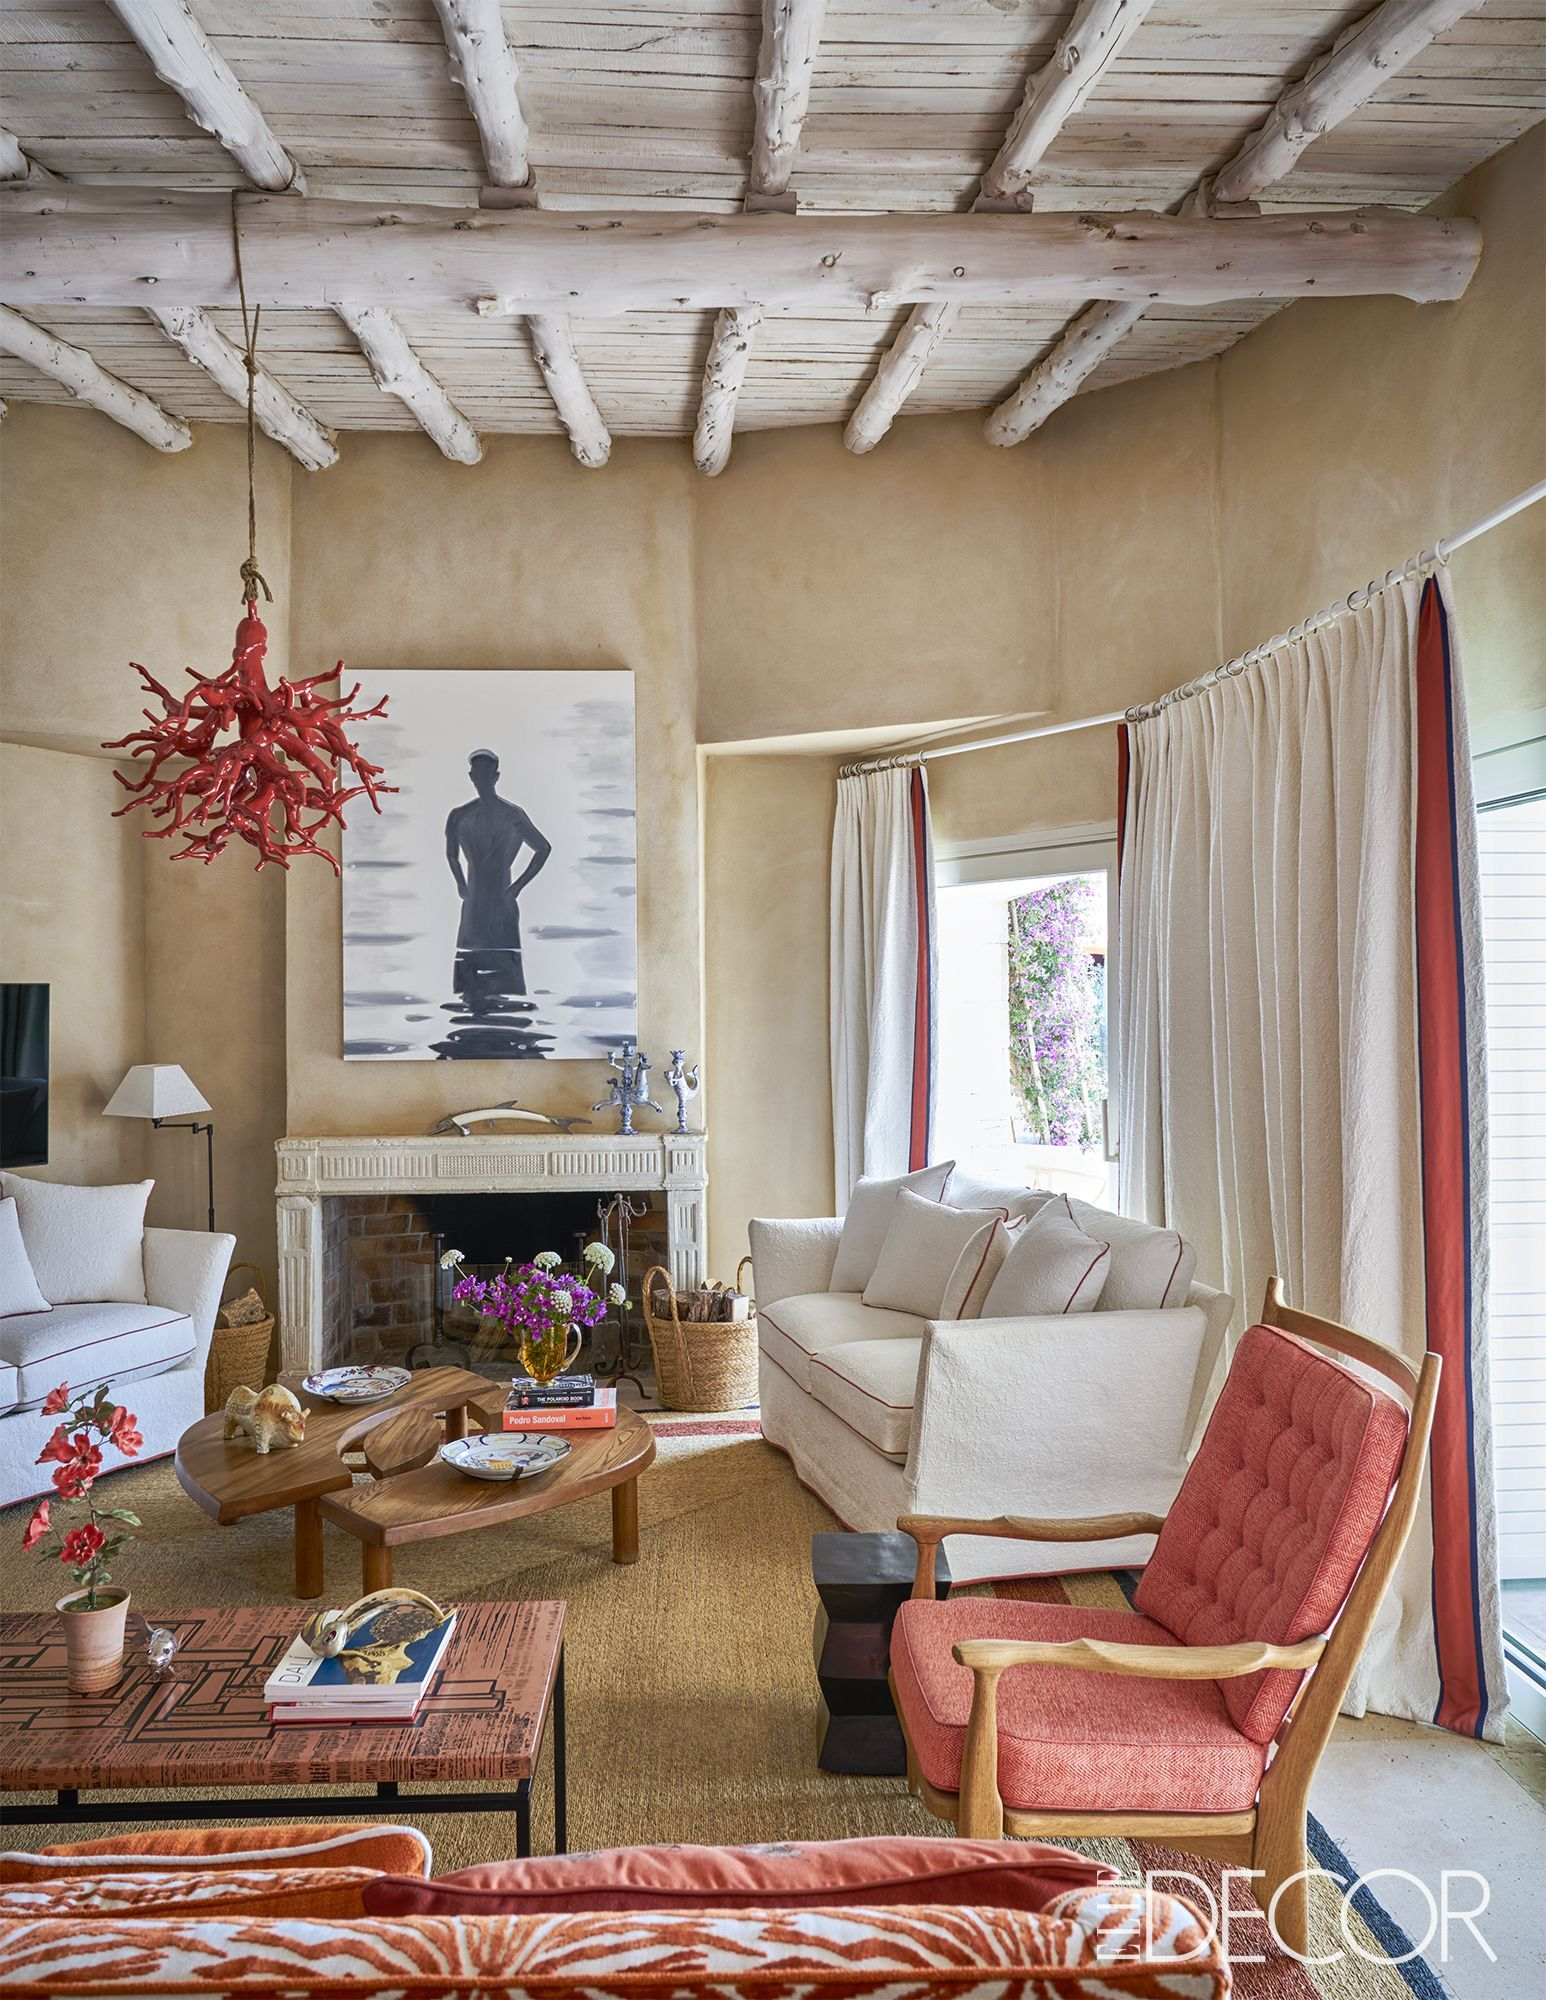 This Serene Ibiza Beach House Proves Pleasure Seeking Comes In All